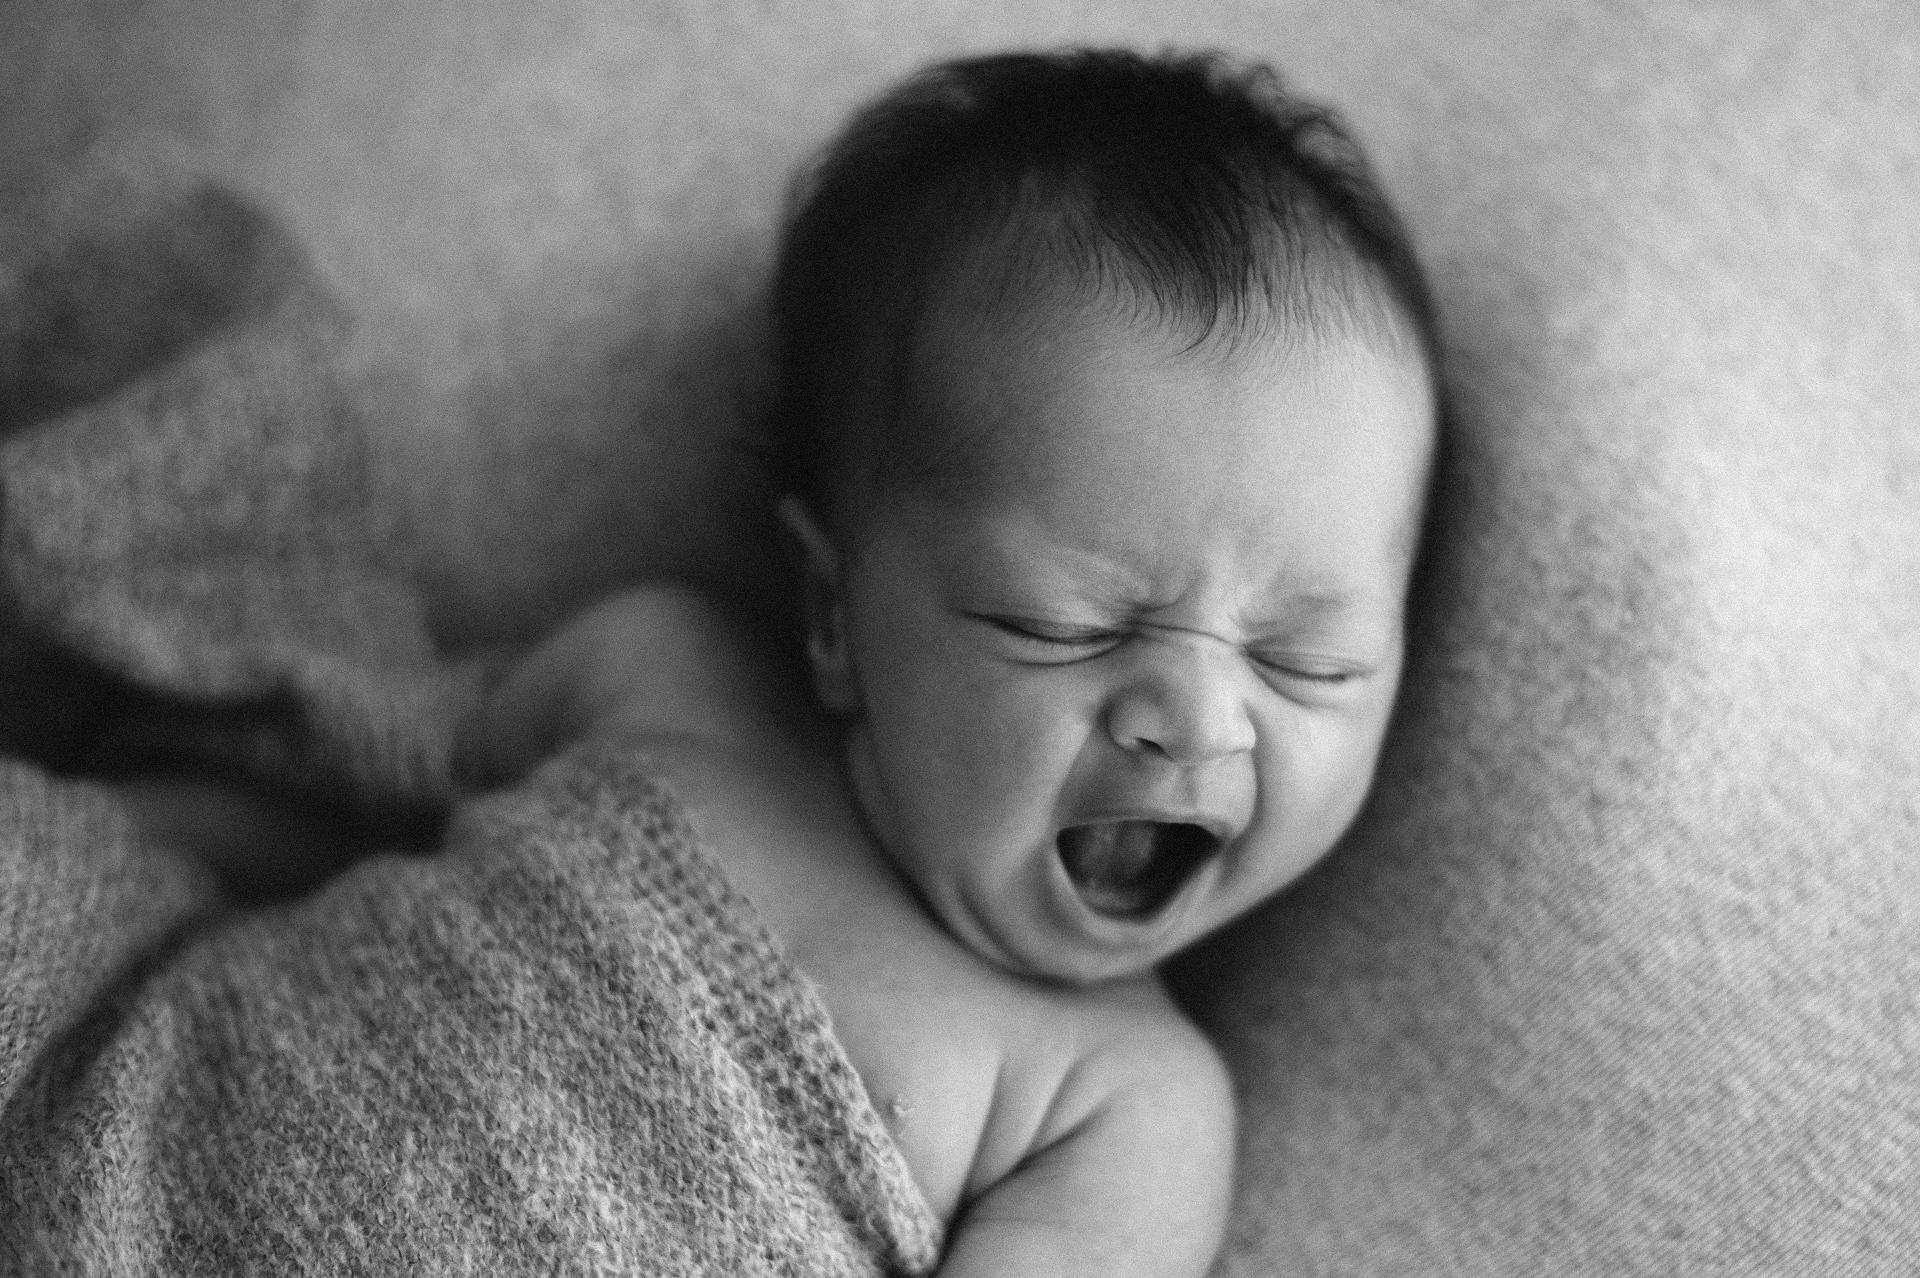 neonato sbadiglia